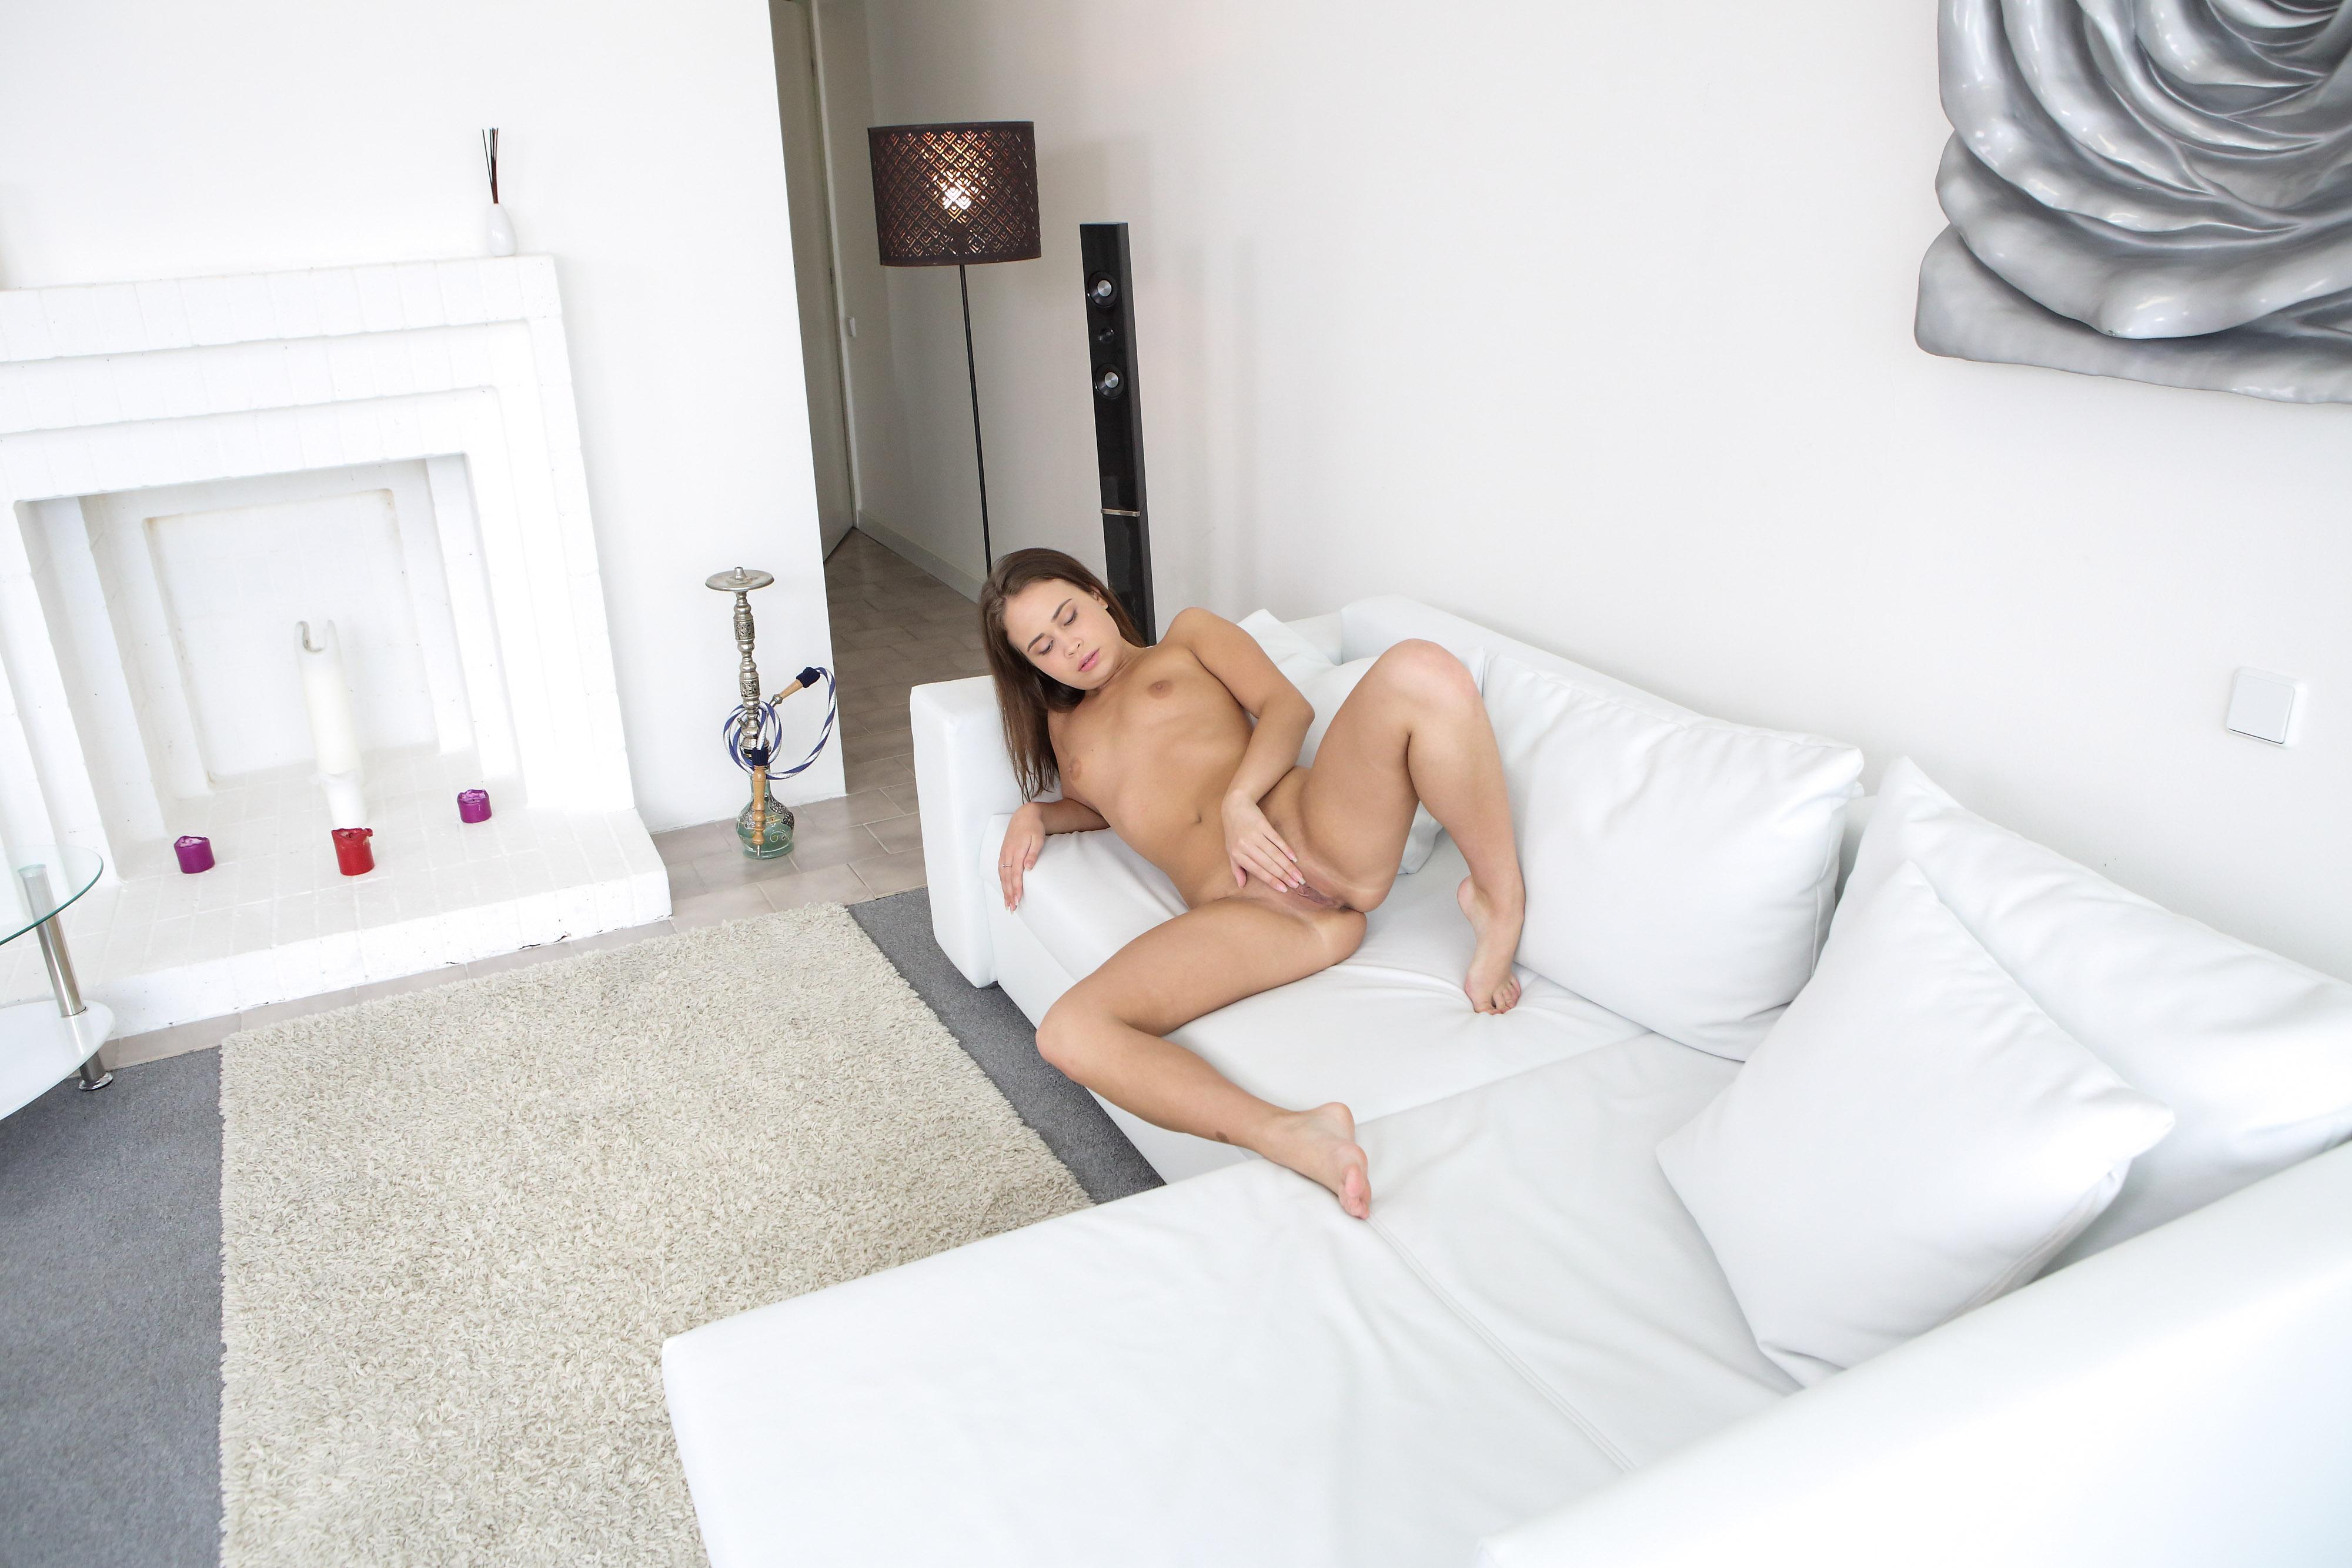 rubbing tiny tits porn